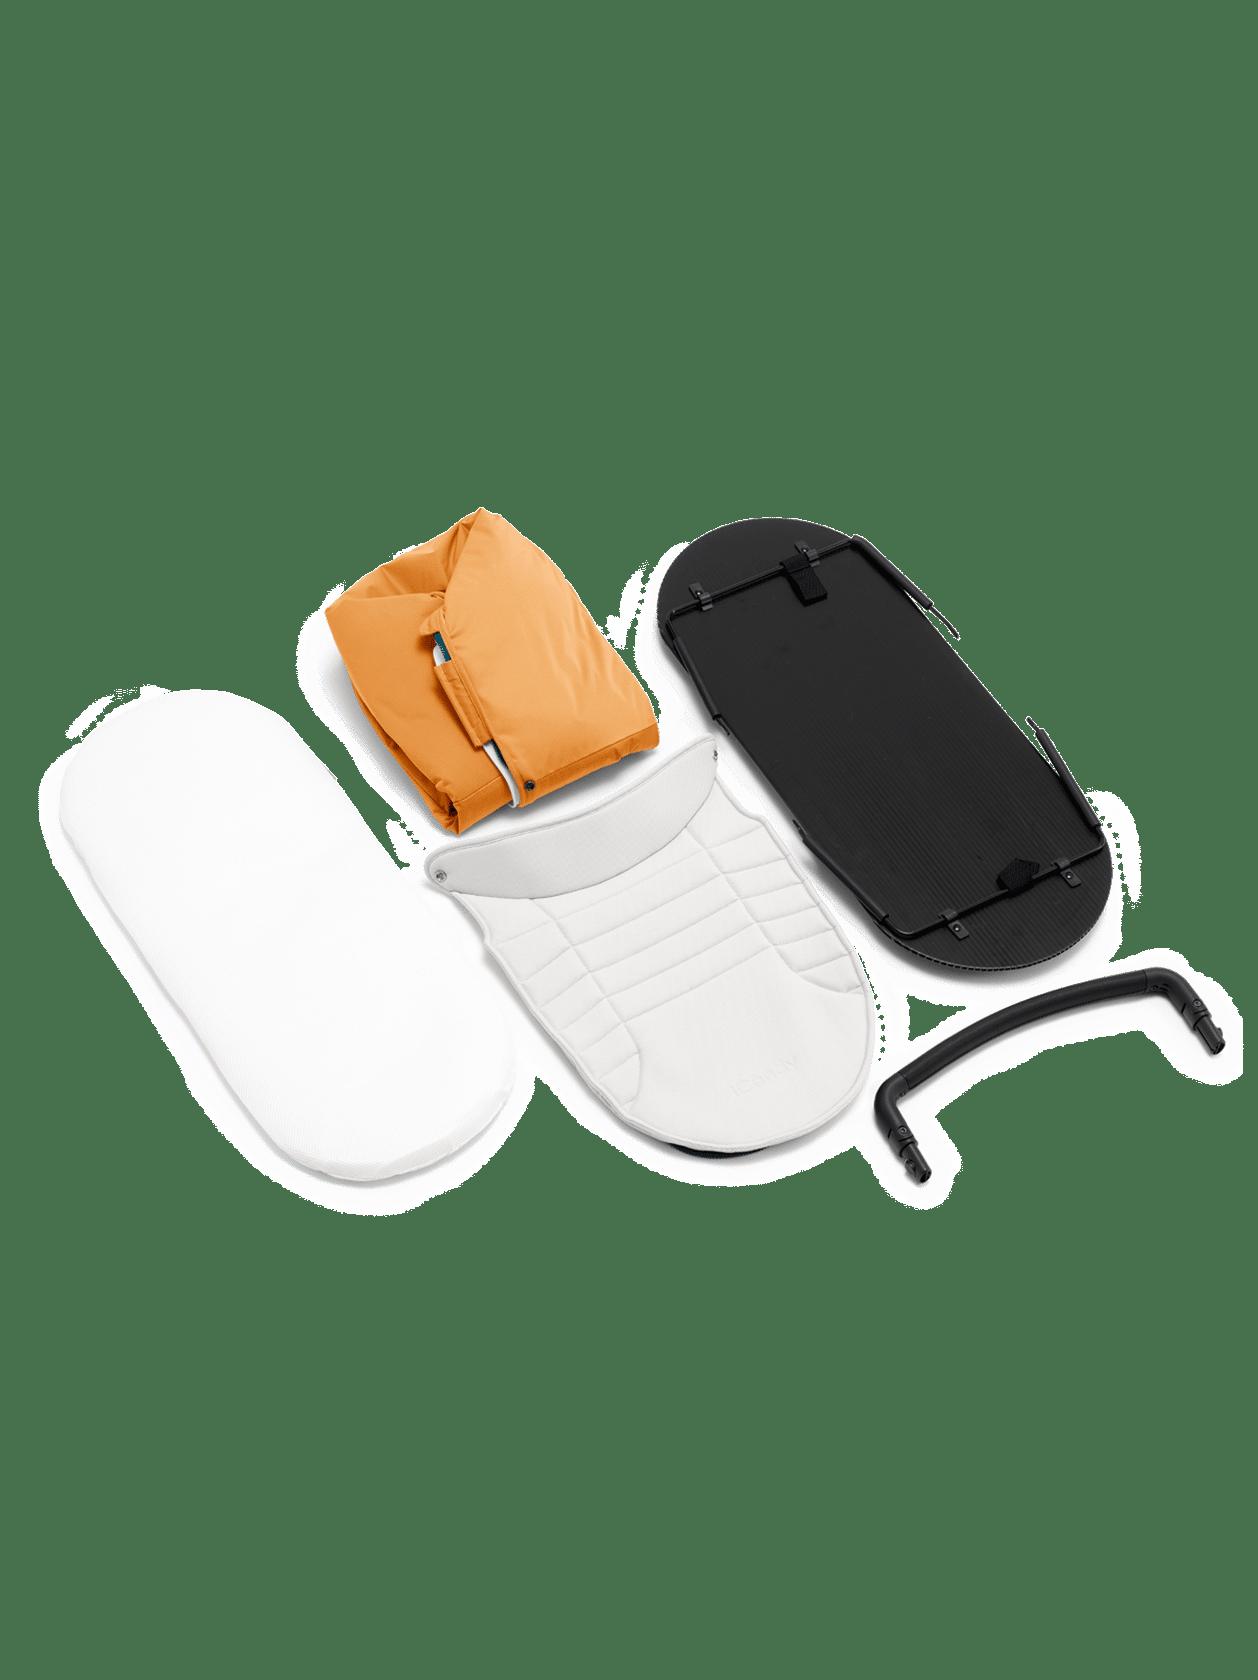 Peach 2nd Carrycot Fabric - Nectar